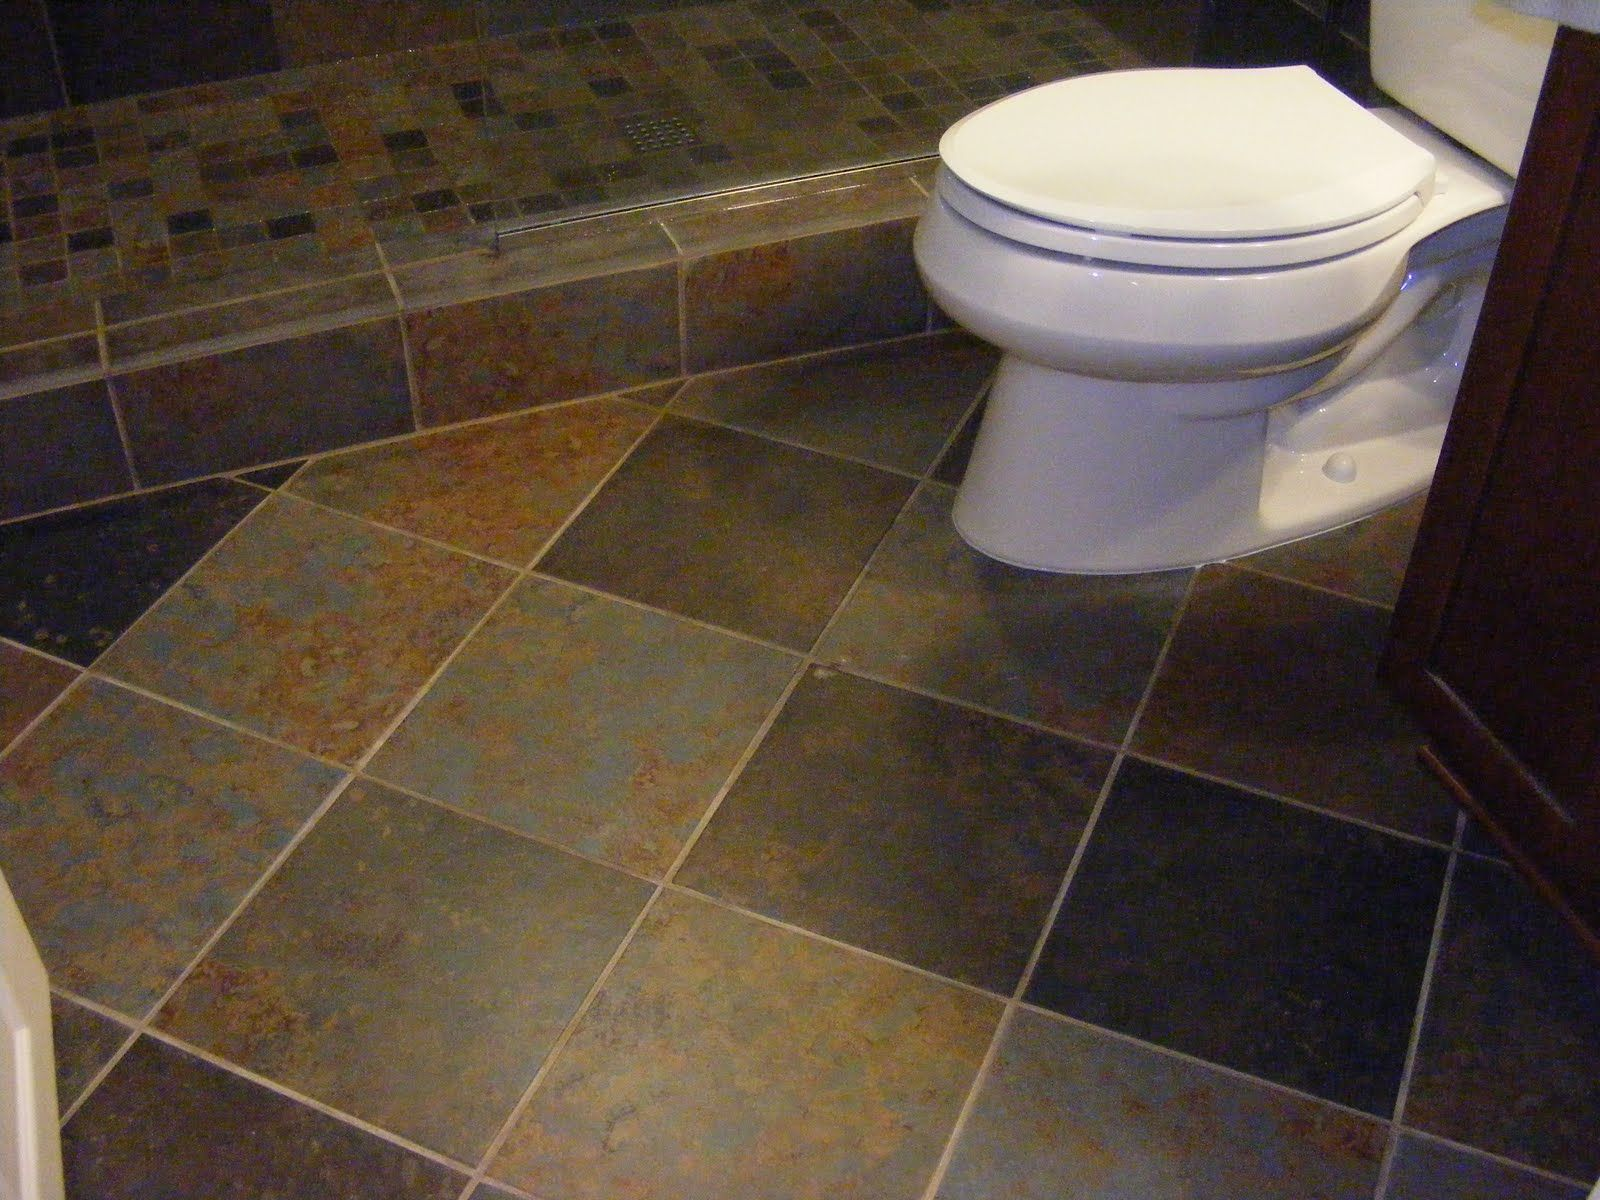 Bathroom floor tile floor tile 12 x 12 virginia tile slate multi bathroom floor tile floor tile 12 x 12 virginia tile slate multi color doublecrazyfo Choice Image